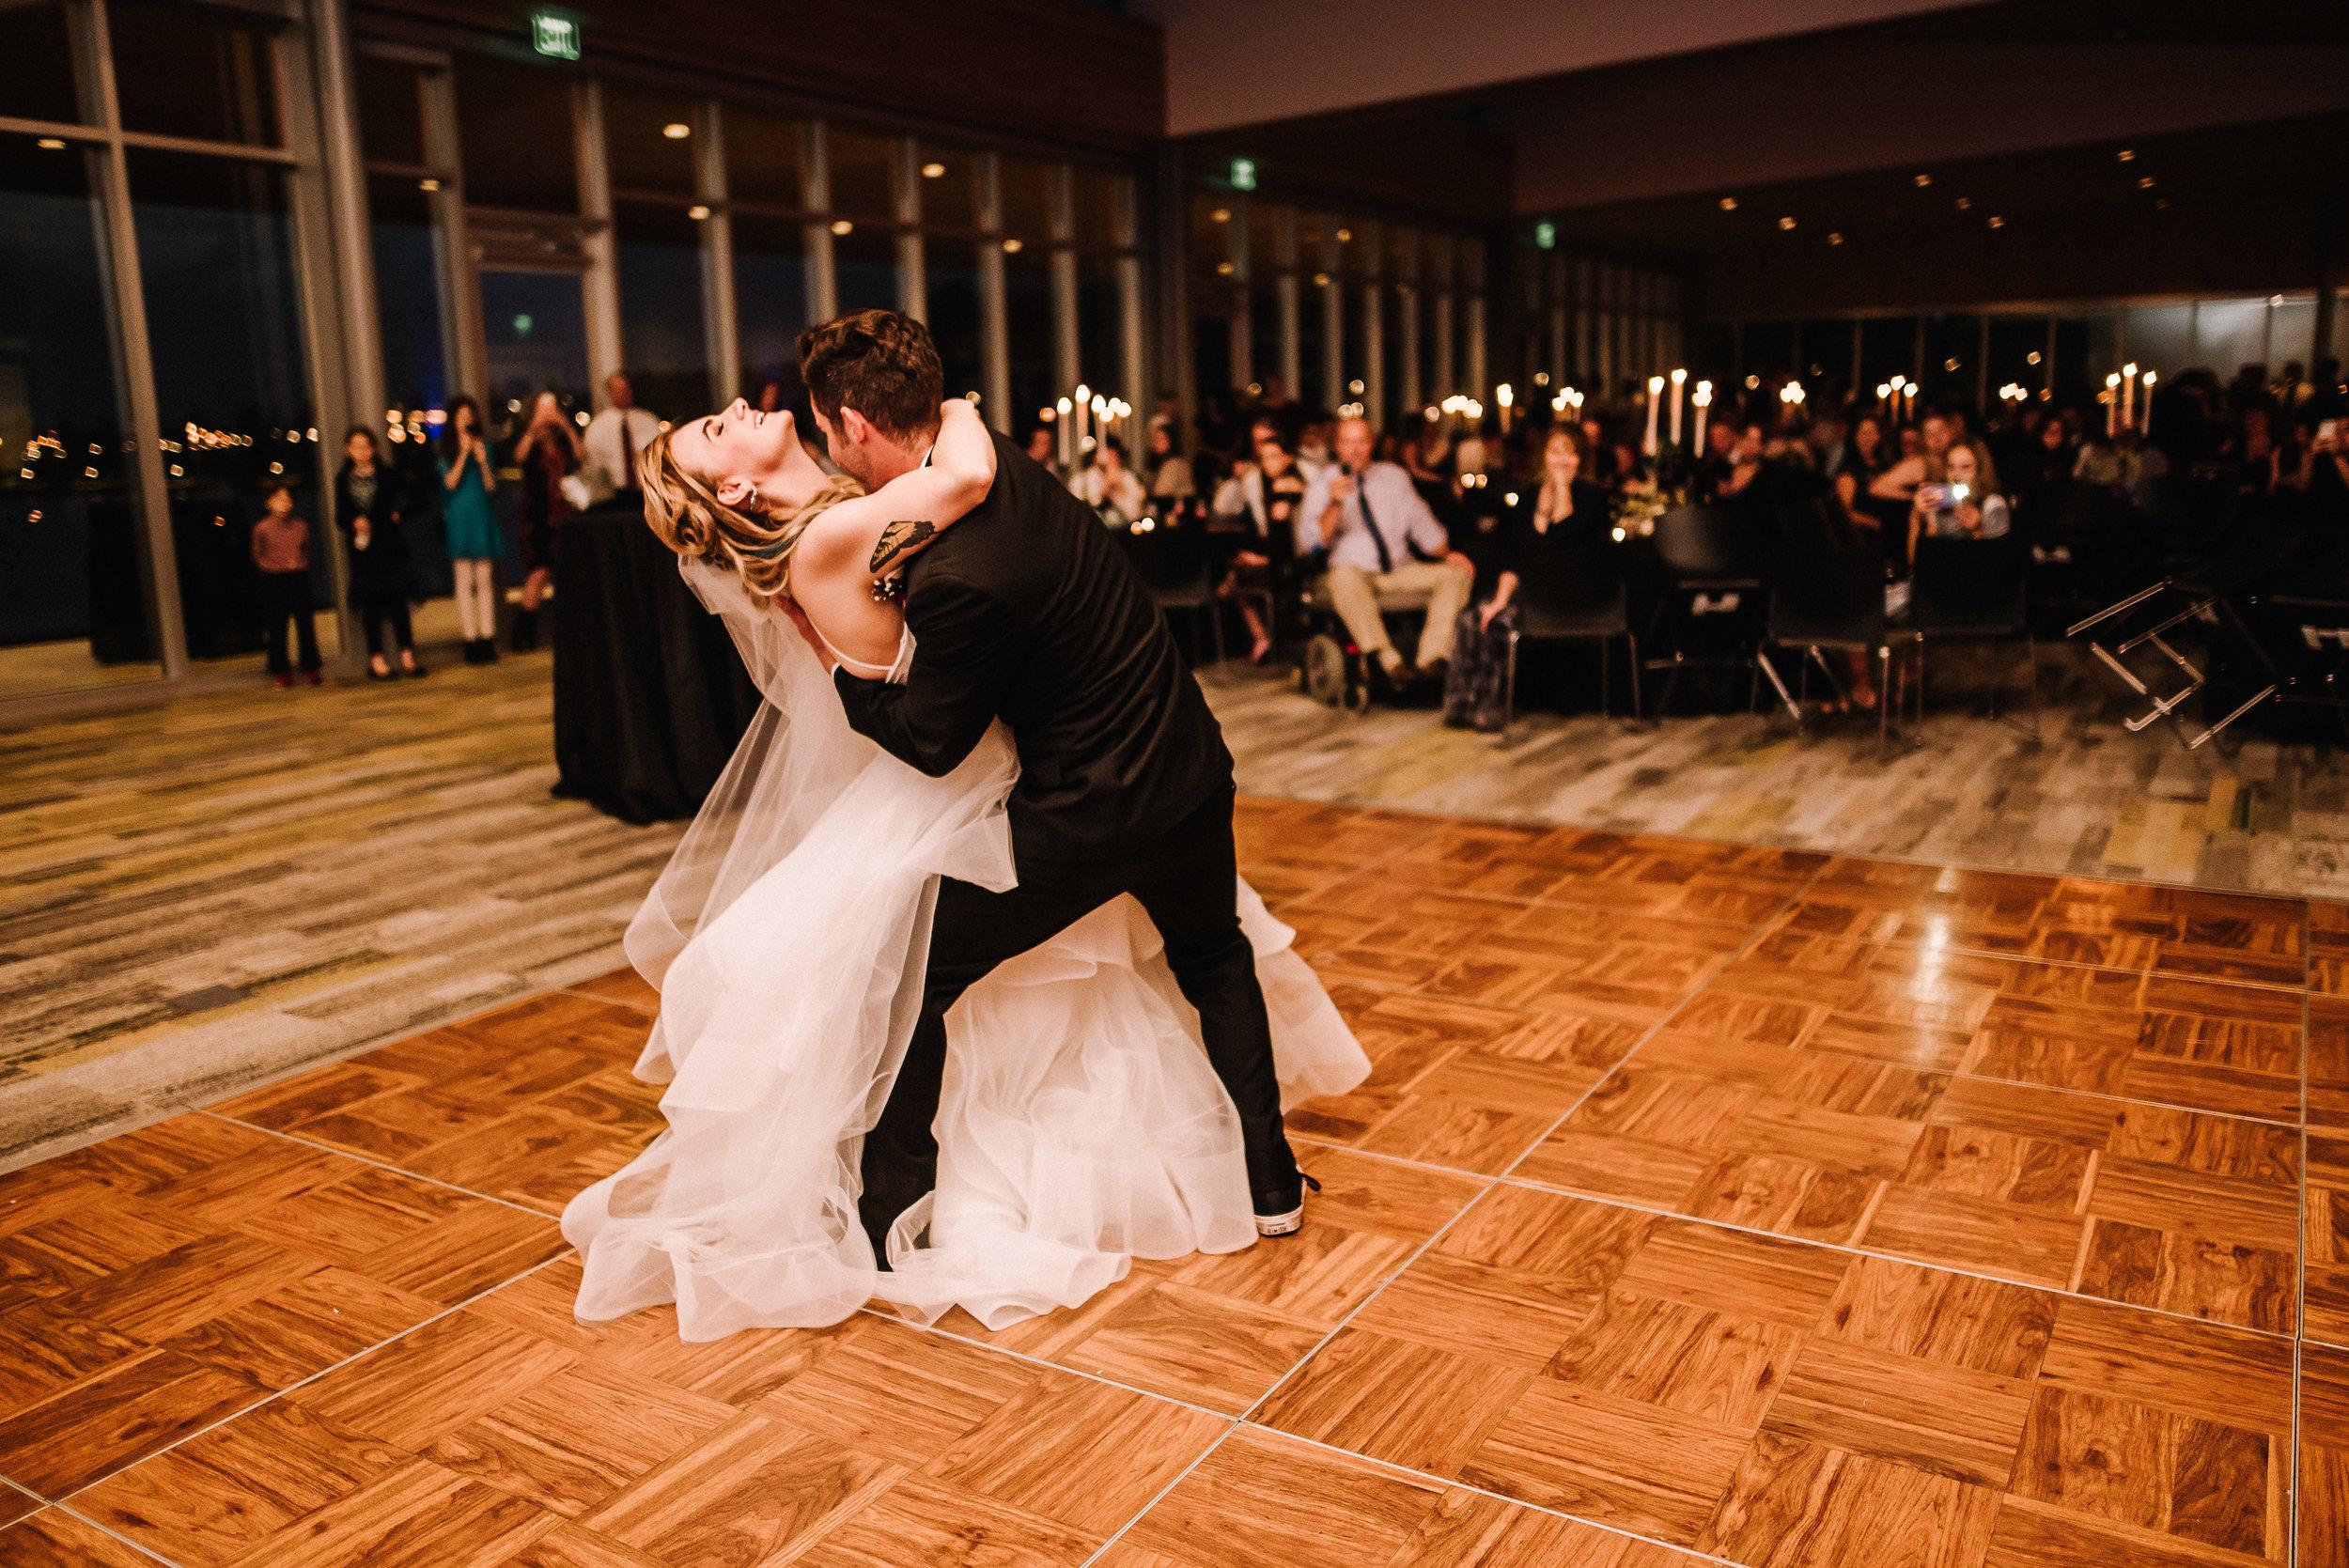 Lucchesi-Wedding_Shelby-Farms_Ashley-Benham-Photography-802.jpg